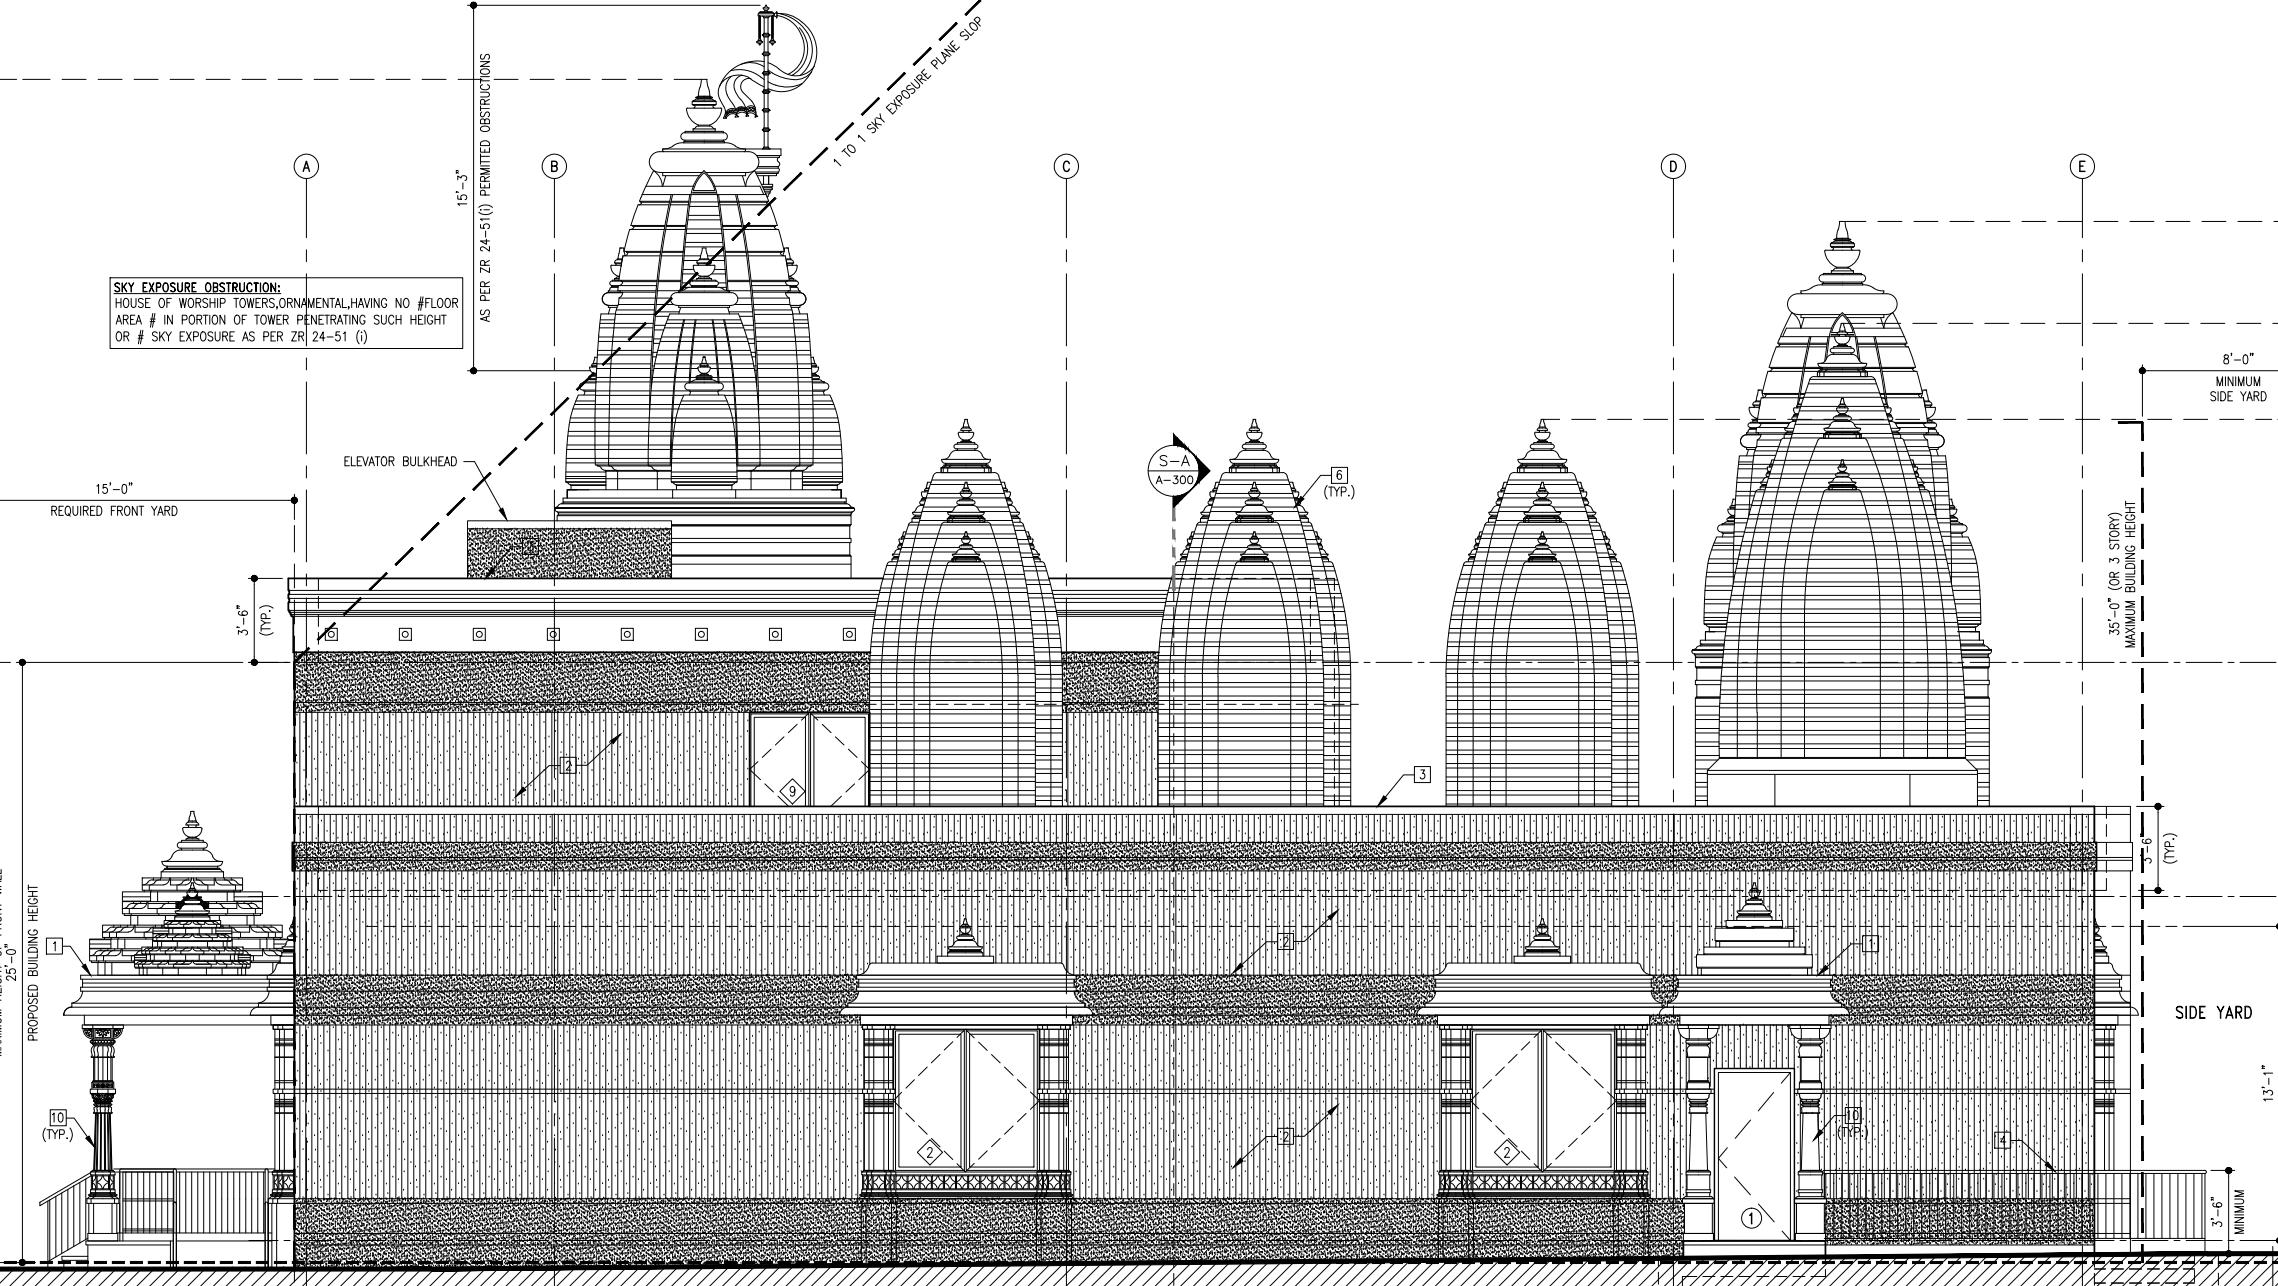 West side of 264-12 Hillside Avenue, drawing by Manish Savani Architect